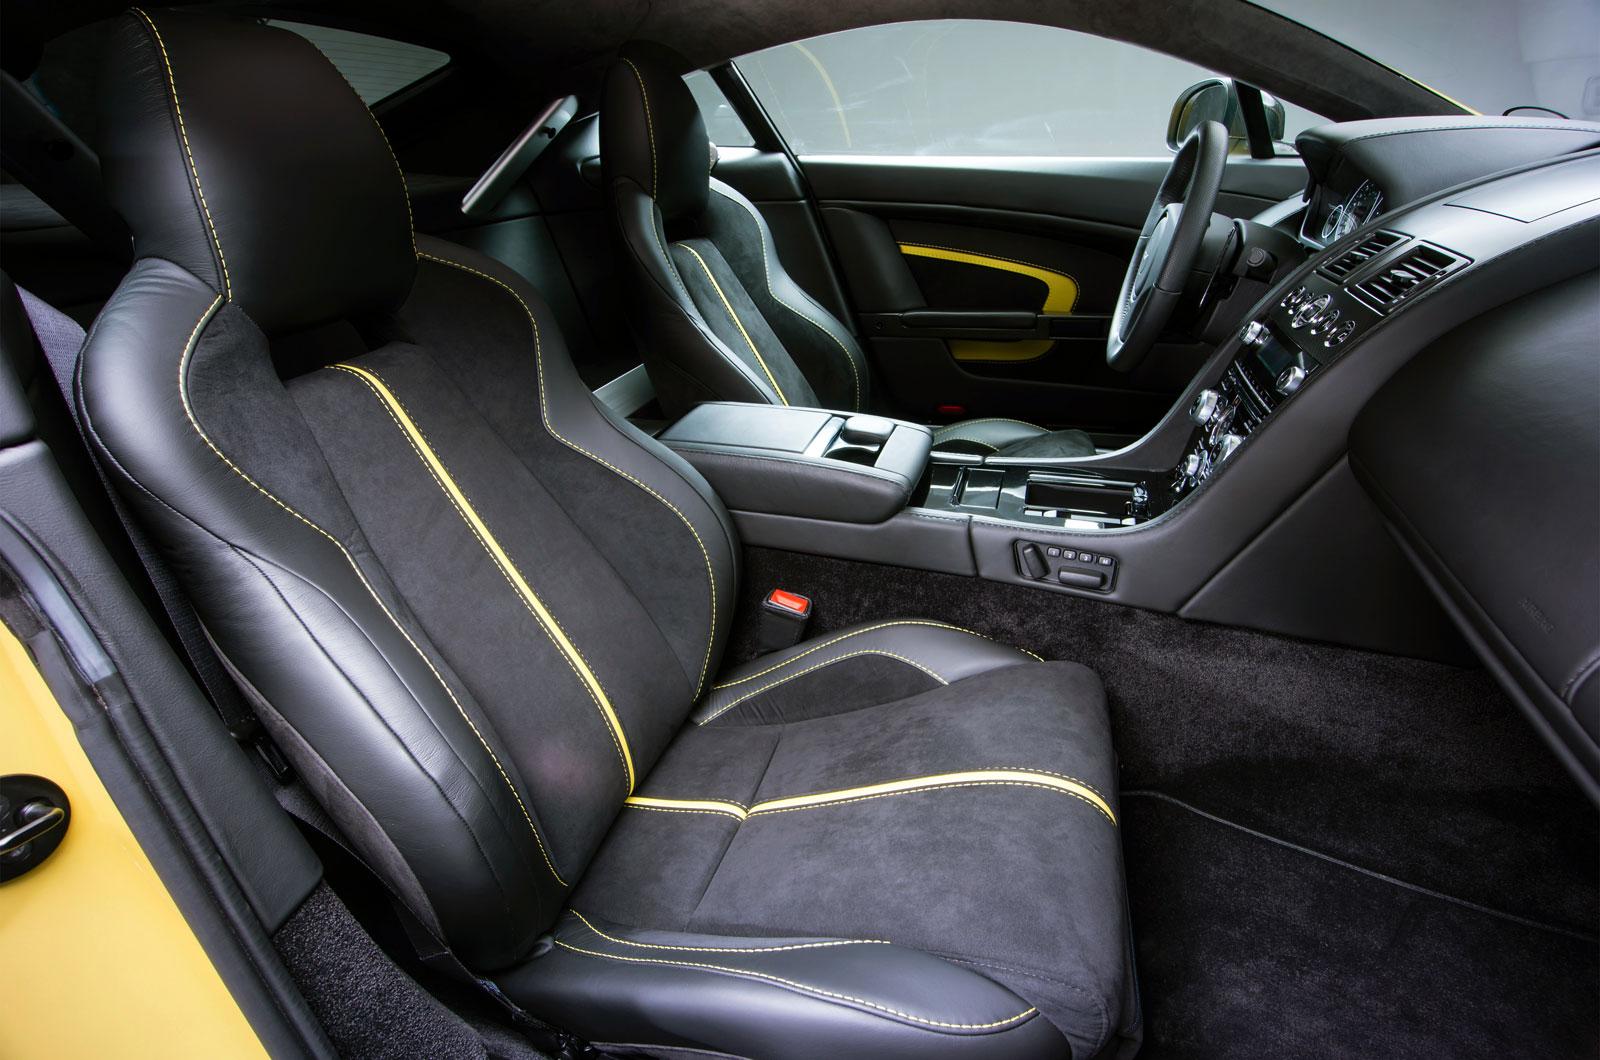 Aston Martin V12 Vantage S Interior Car Body Design